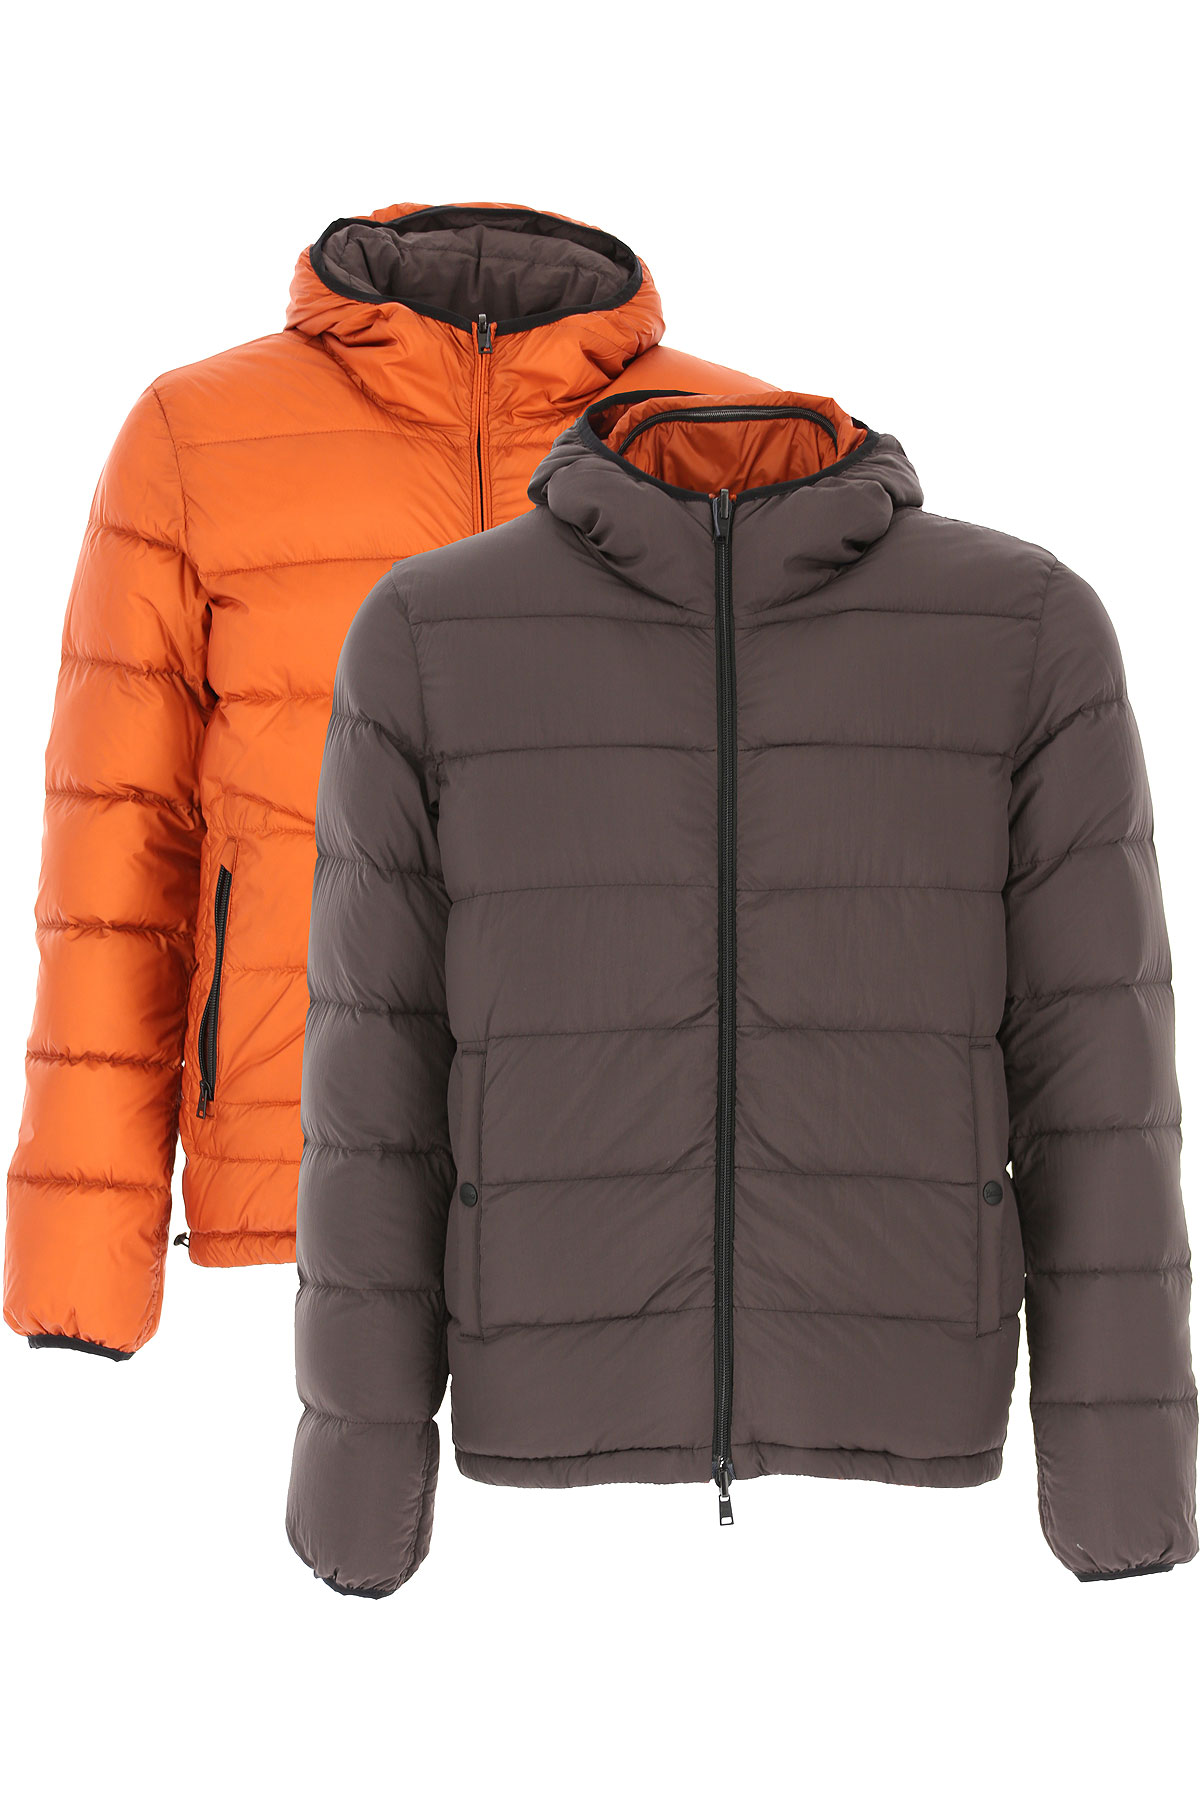 Herno Down Jacket for Men, Puffer Ski Jacket On Sale, Brown, polyamide, 2019, L XL